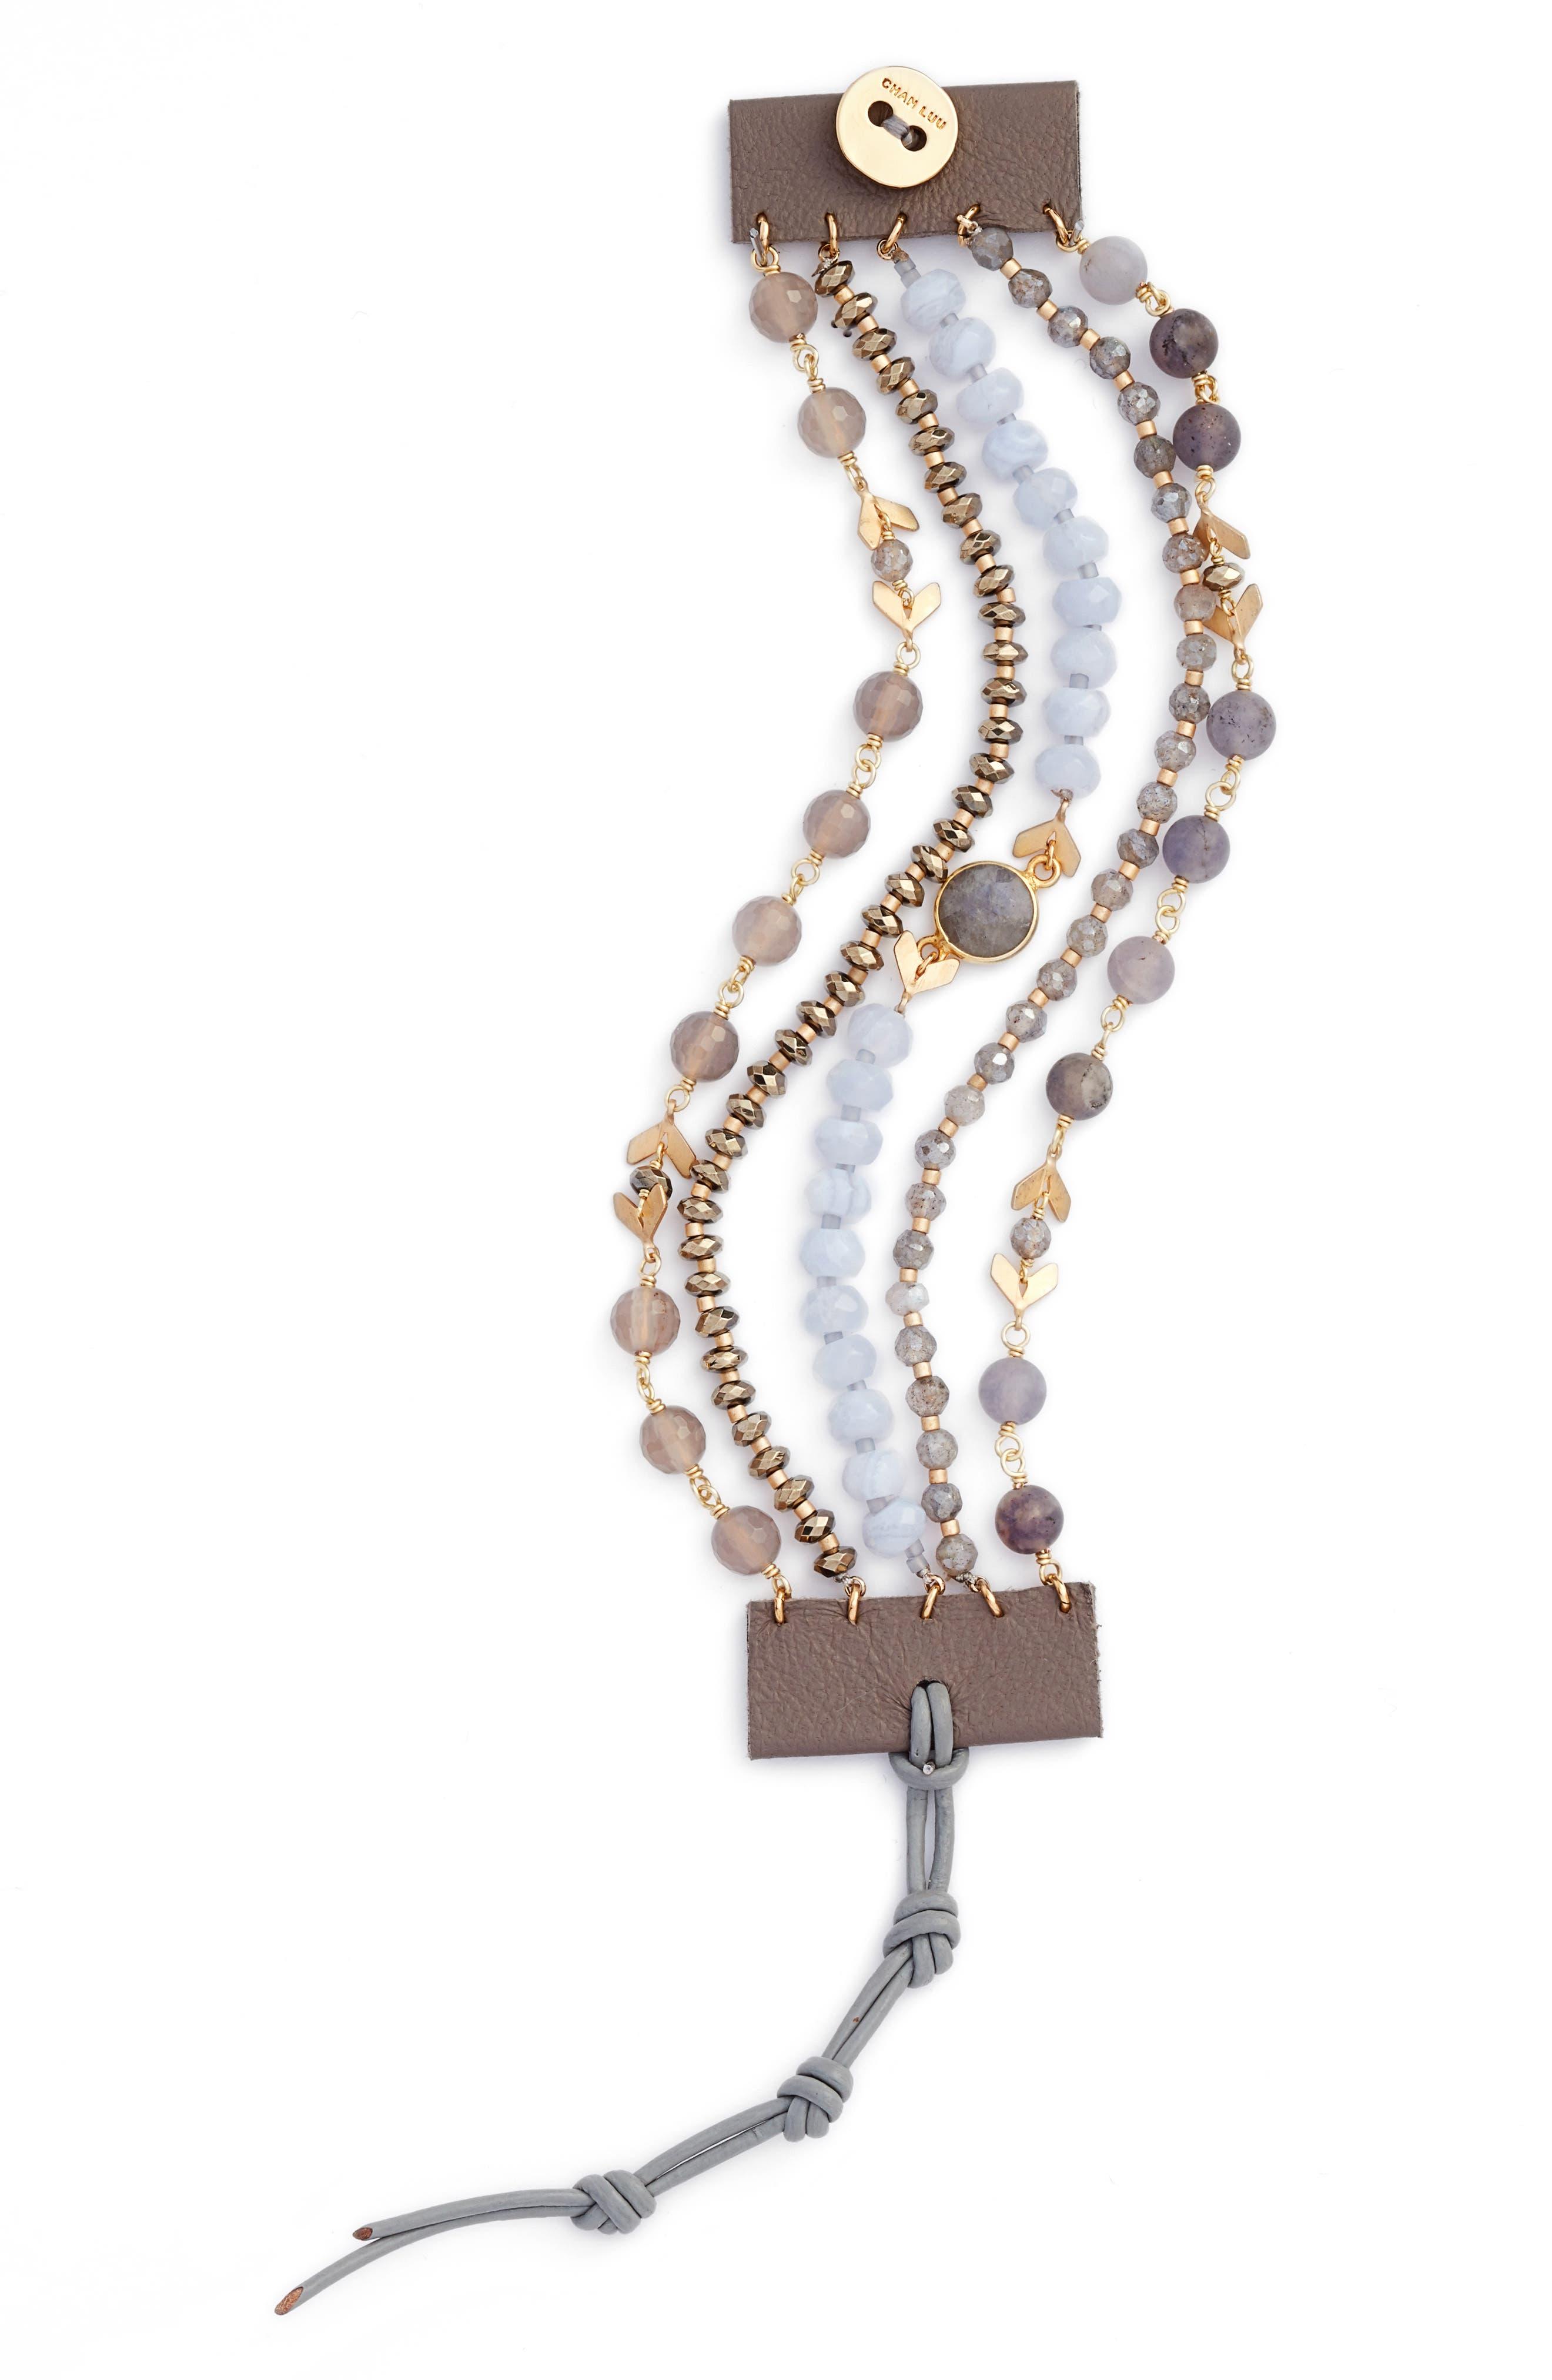 Multistrand Semiprecious Stone Bracelet,                         Main,                         color, Blue Lace Agate Mix